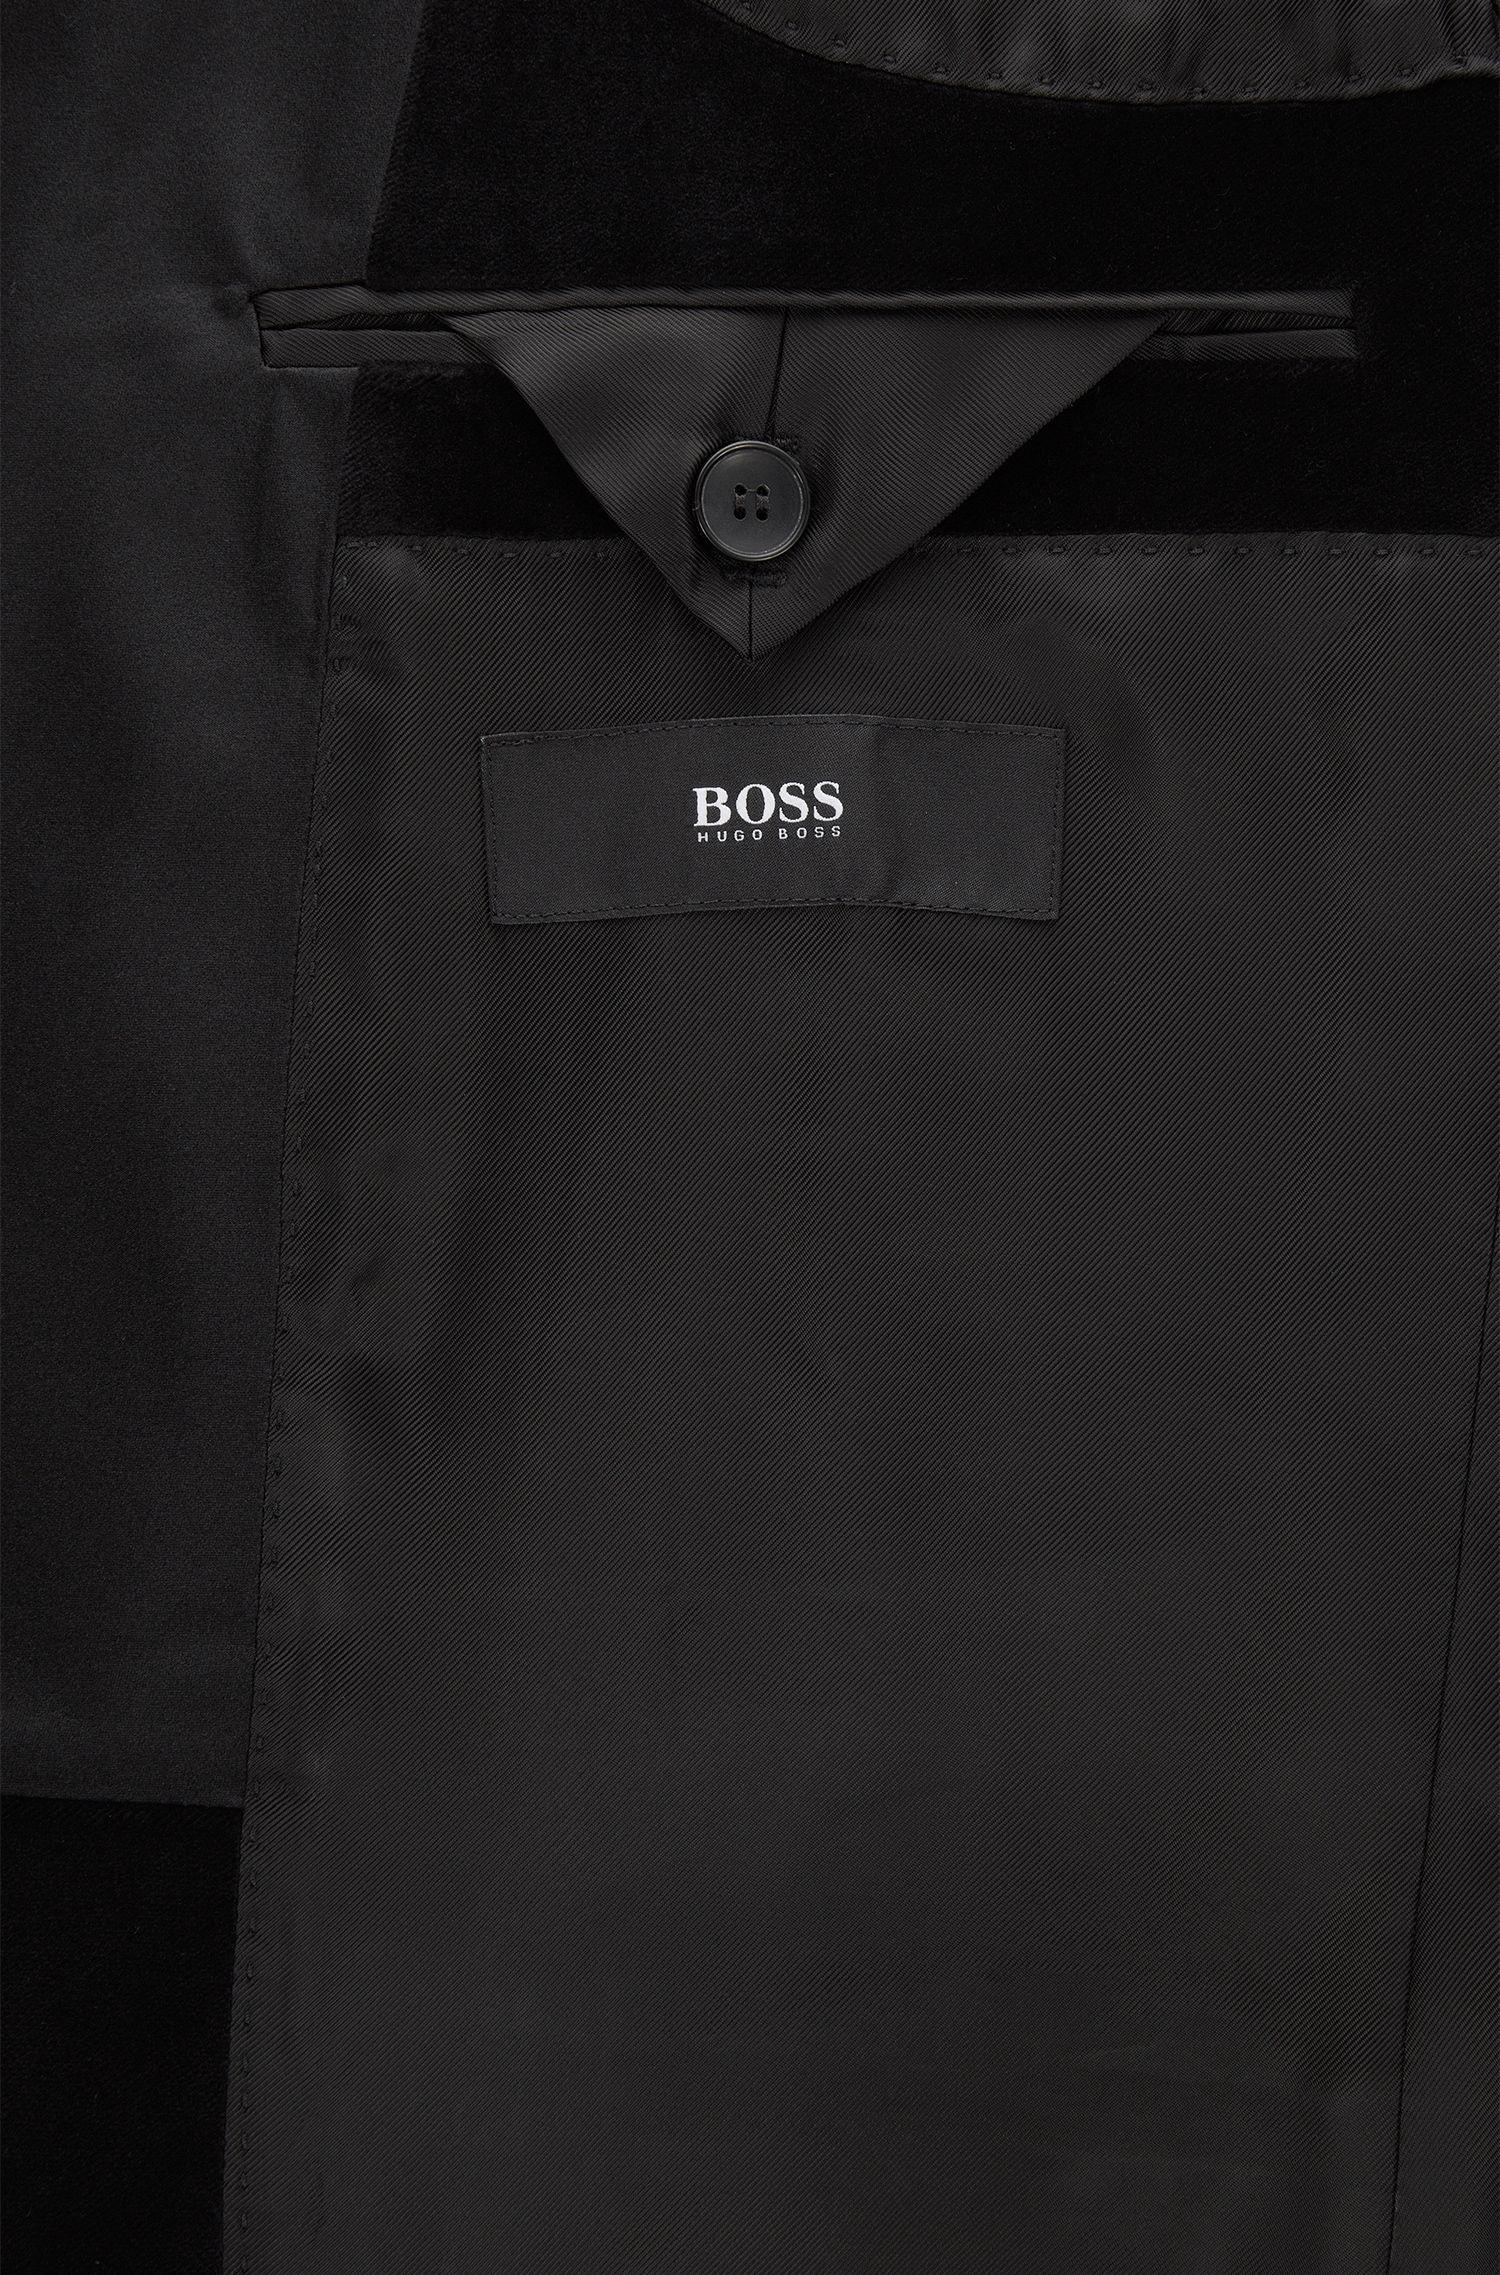 Velvet Tuxedo, Slim Fit | Herwyn/Gewon, Black